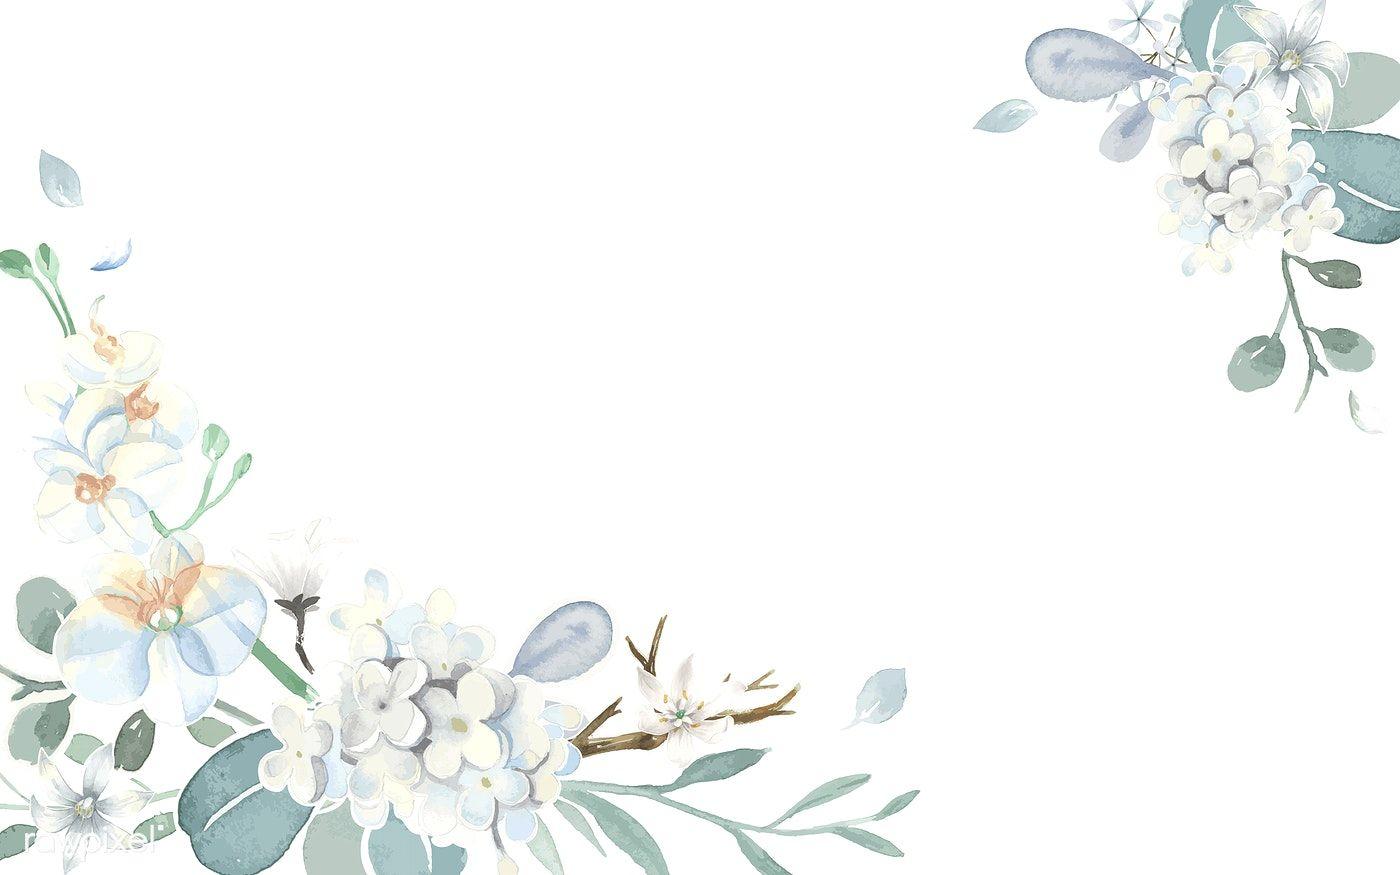 Download Premium Vector Of Invitation Card With A Light Blue Theme 466708 Lukisan Bunga Lukisan Cat Air Kartu Pernikahan